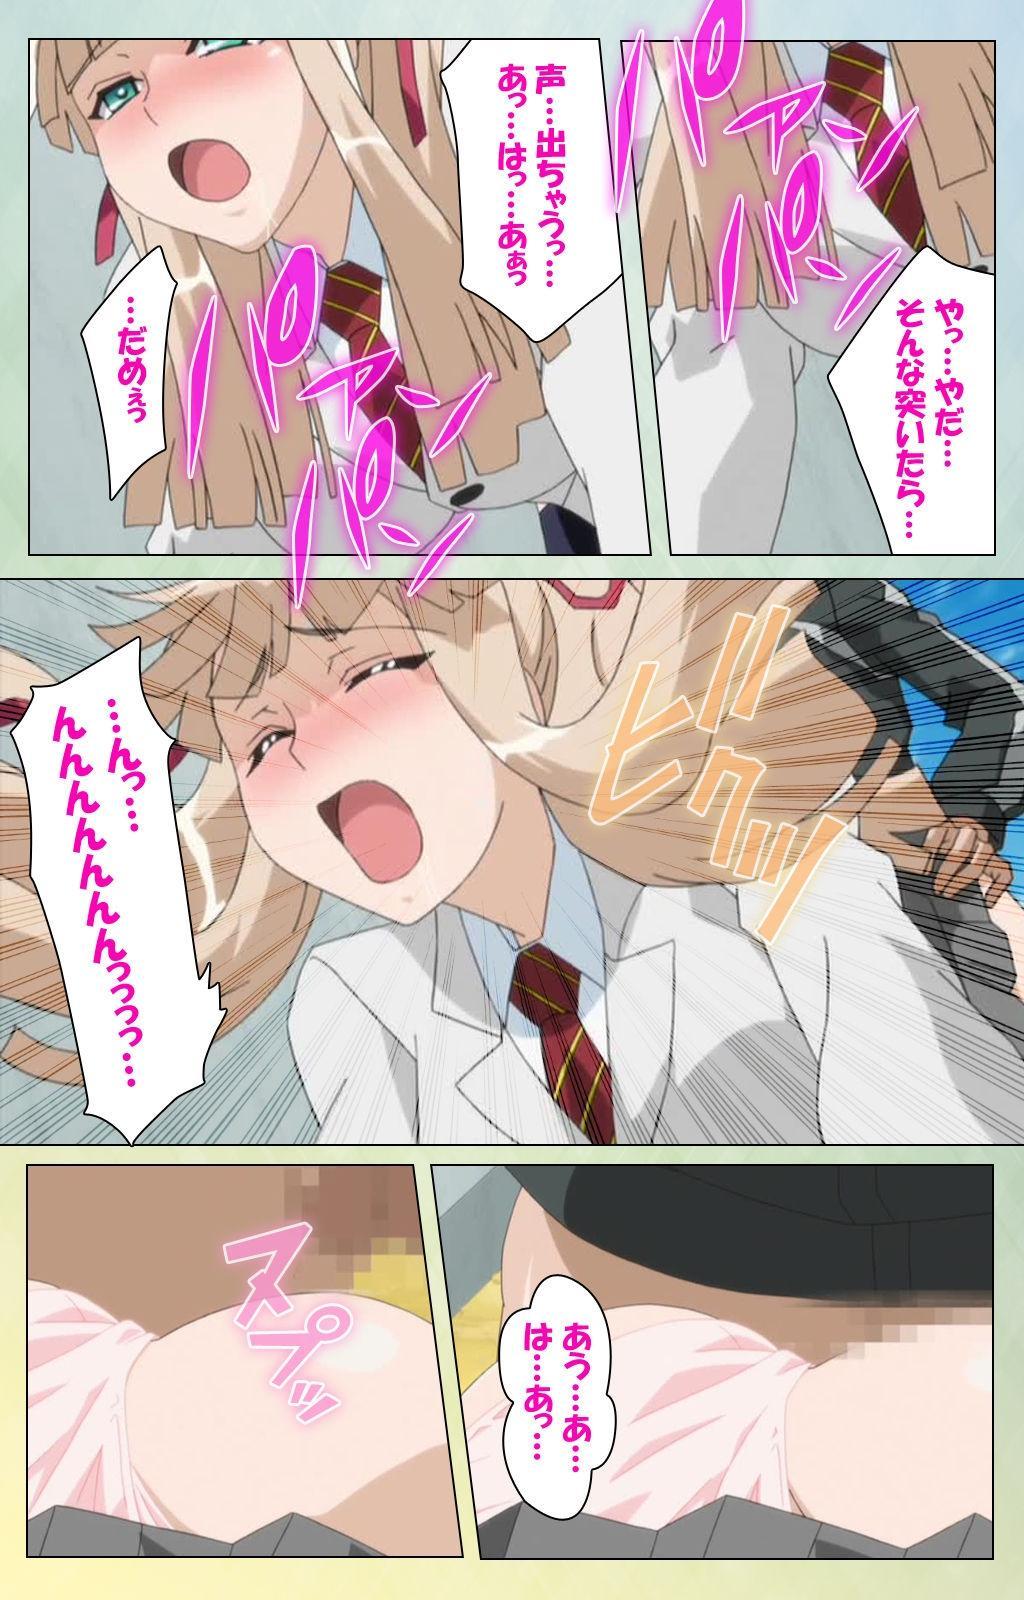 Furueru Kuchibiru fuzzy lips0 Complete Ban 43